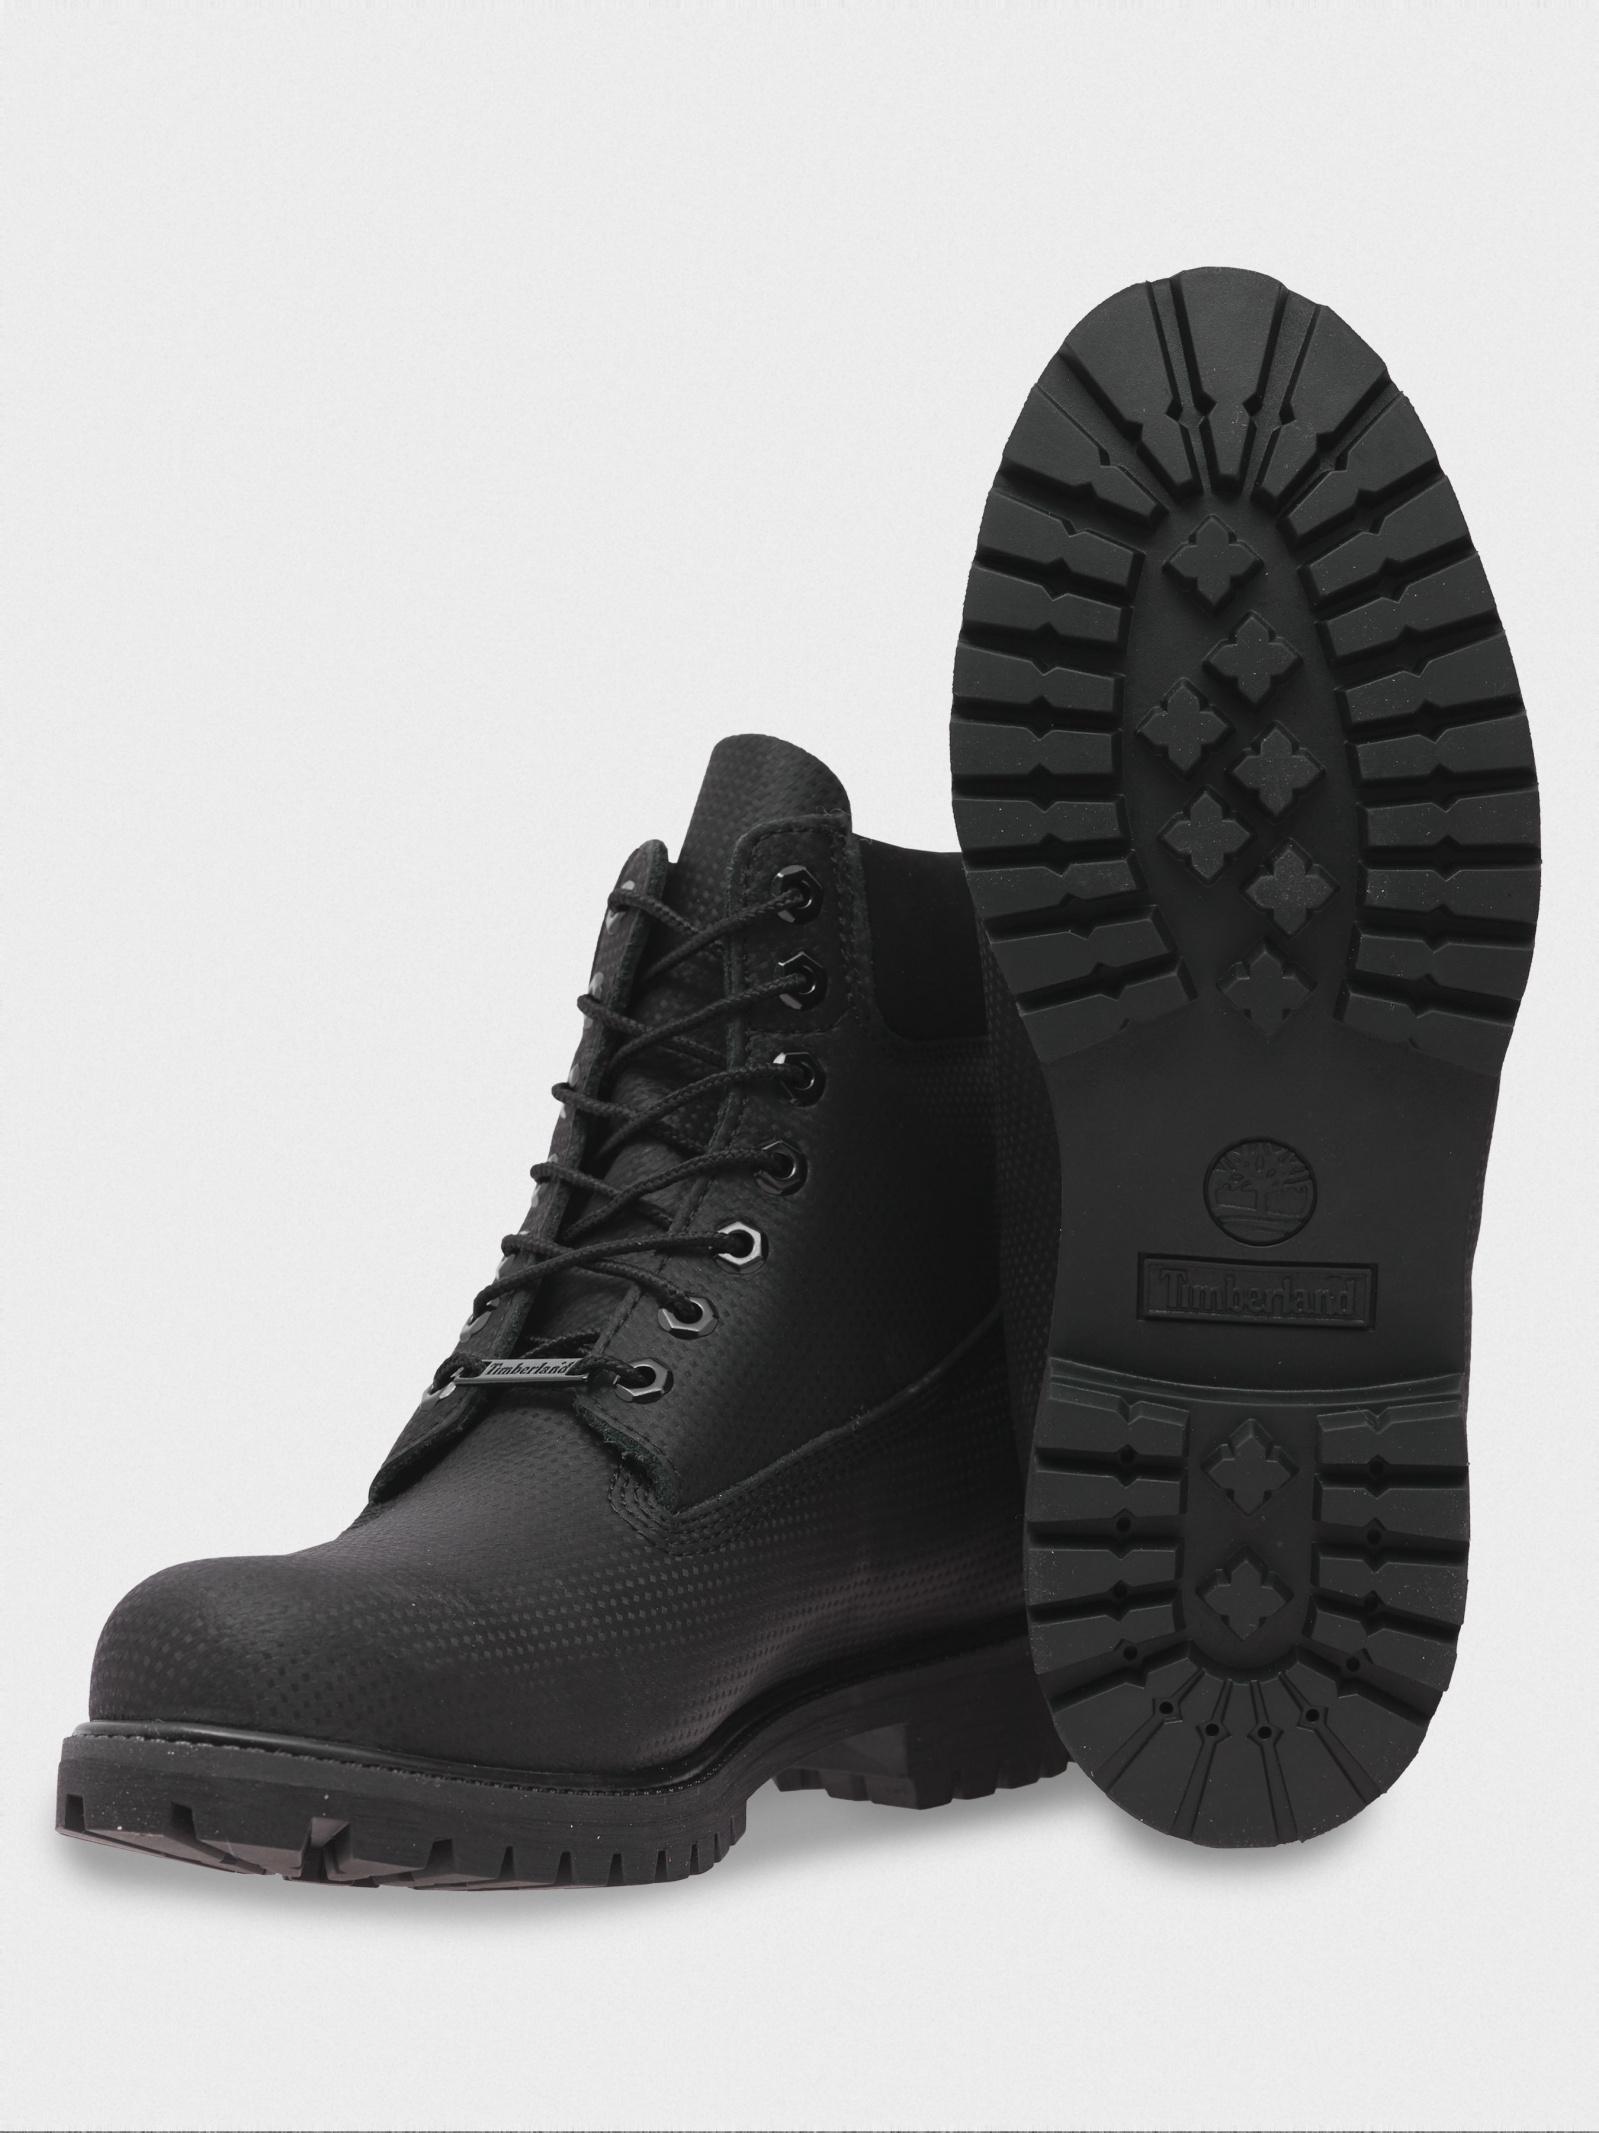 Ботинки для мужчин Timberland Timberland Premium TF4054 смотреть, 2017